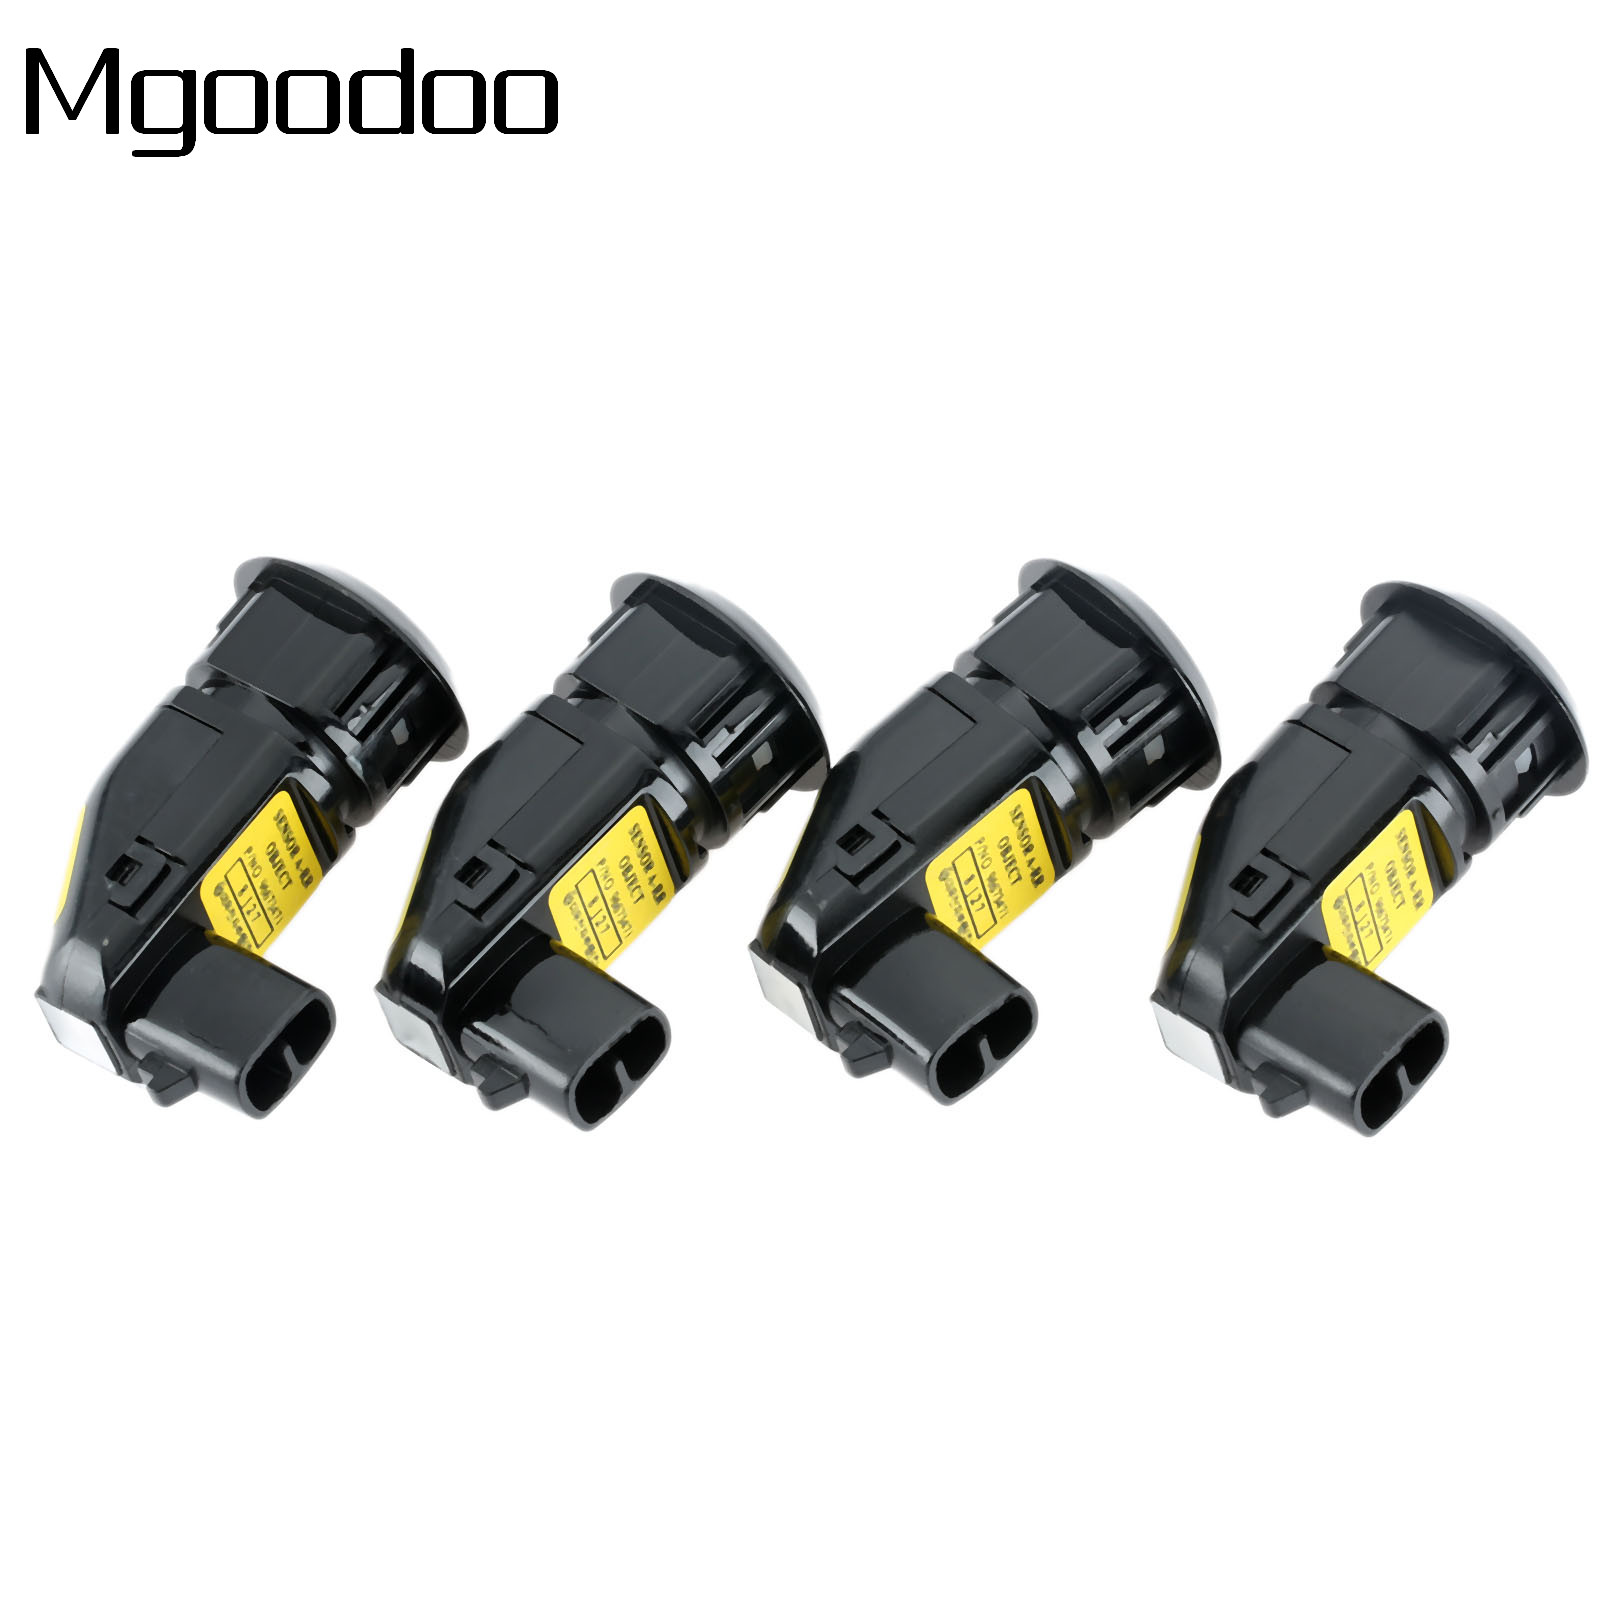 4Pcs For Chevrolet Captiva Parking Assistance Sensors PDC Packing Sensor 96673467 96673464 96673474 96673471 Ultrasonic